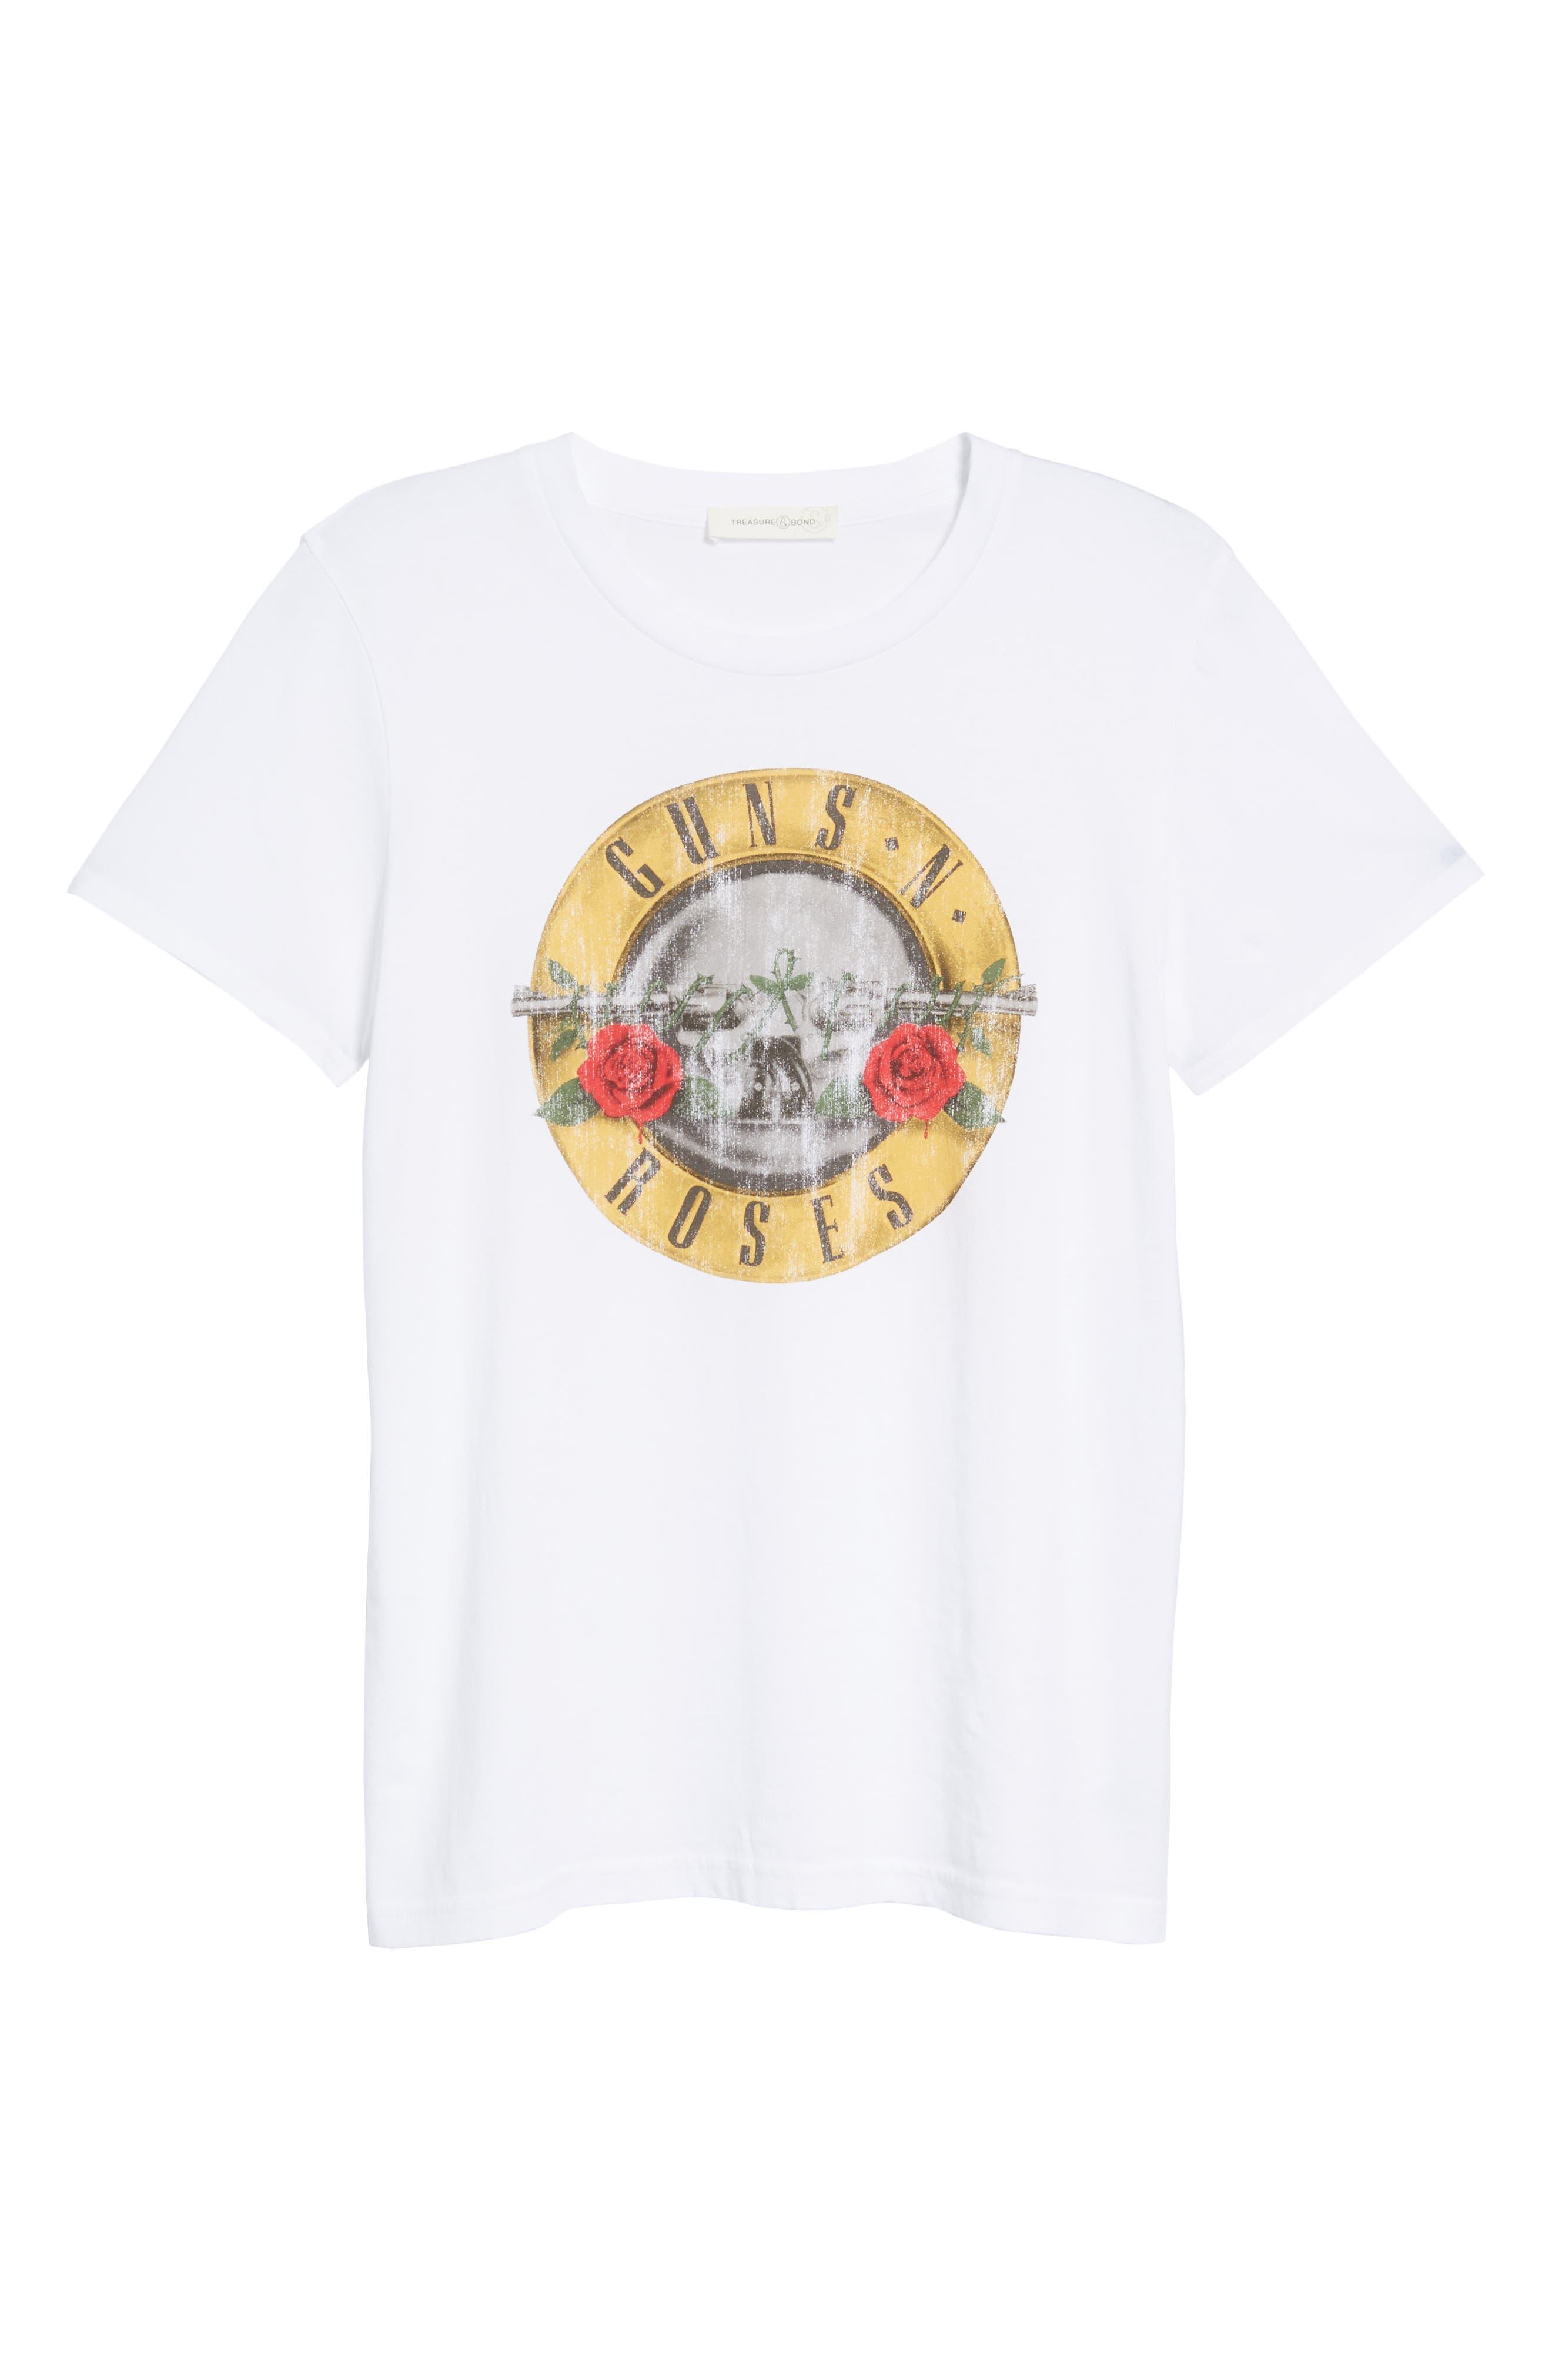 Guns N Roses Graphic Tee,                             Alternate thumbnail 6, color,                             White Combo